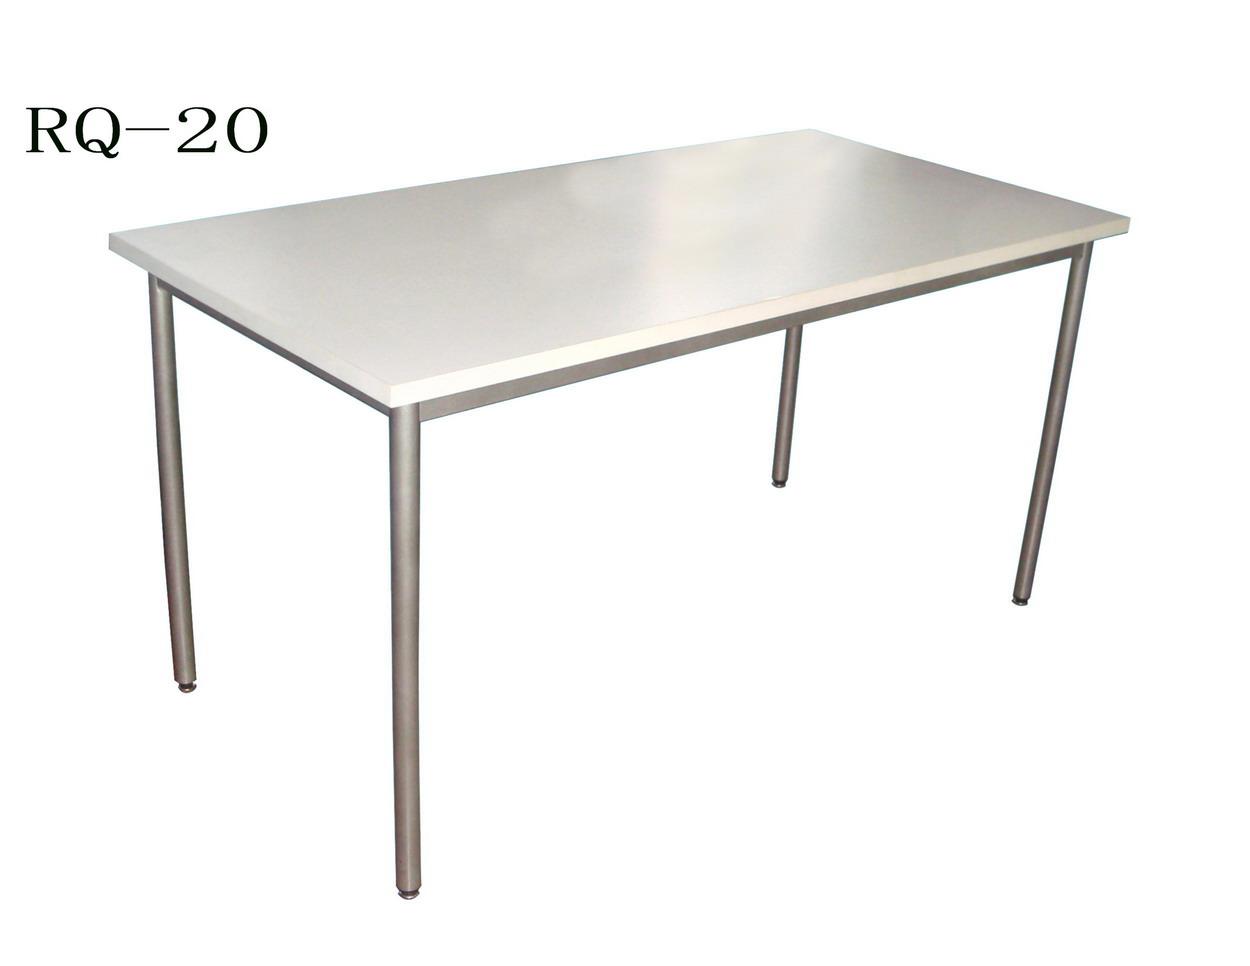 Tables (modular system)